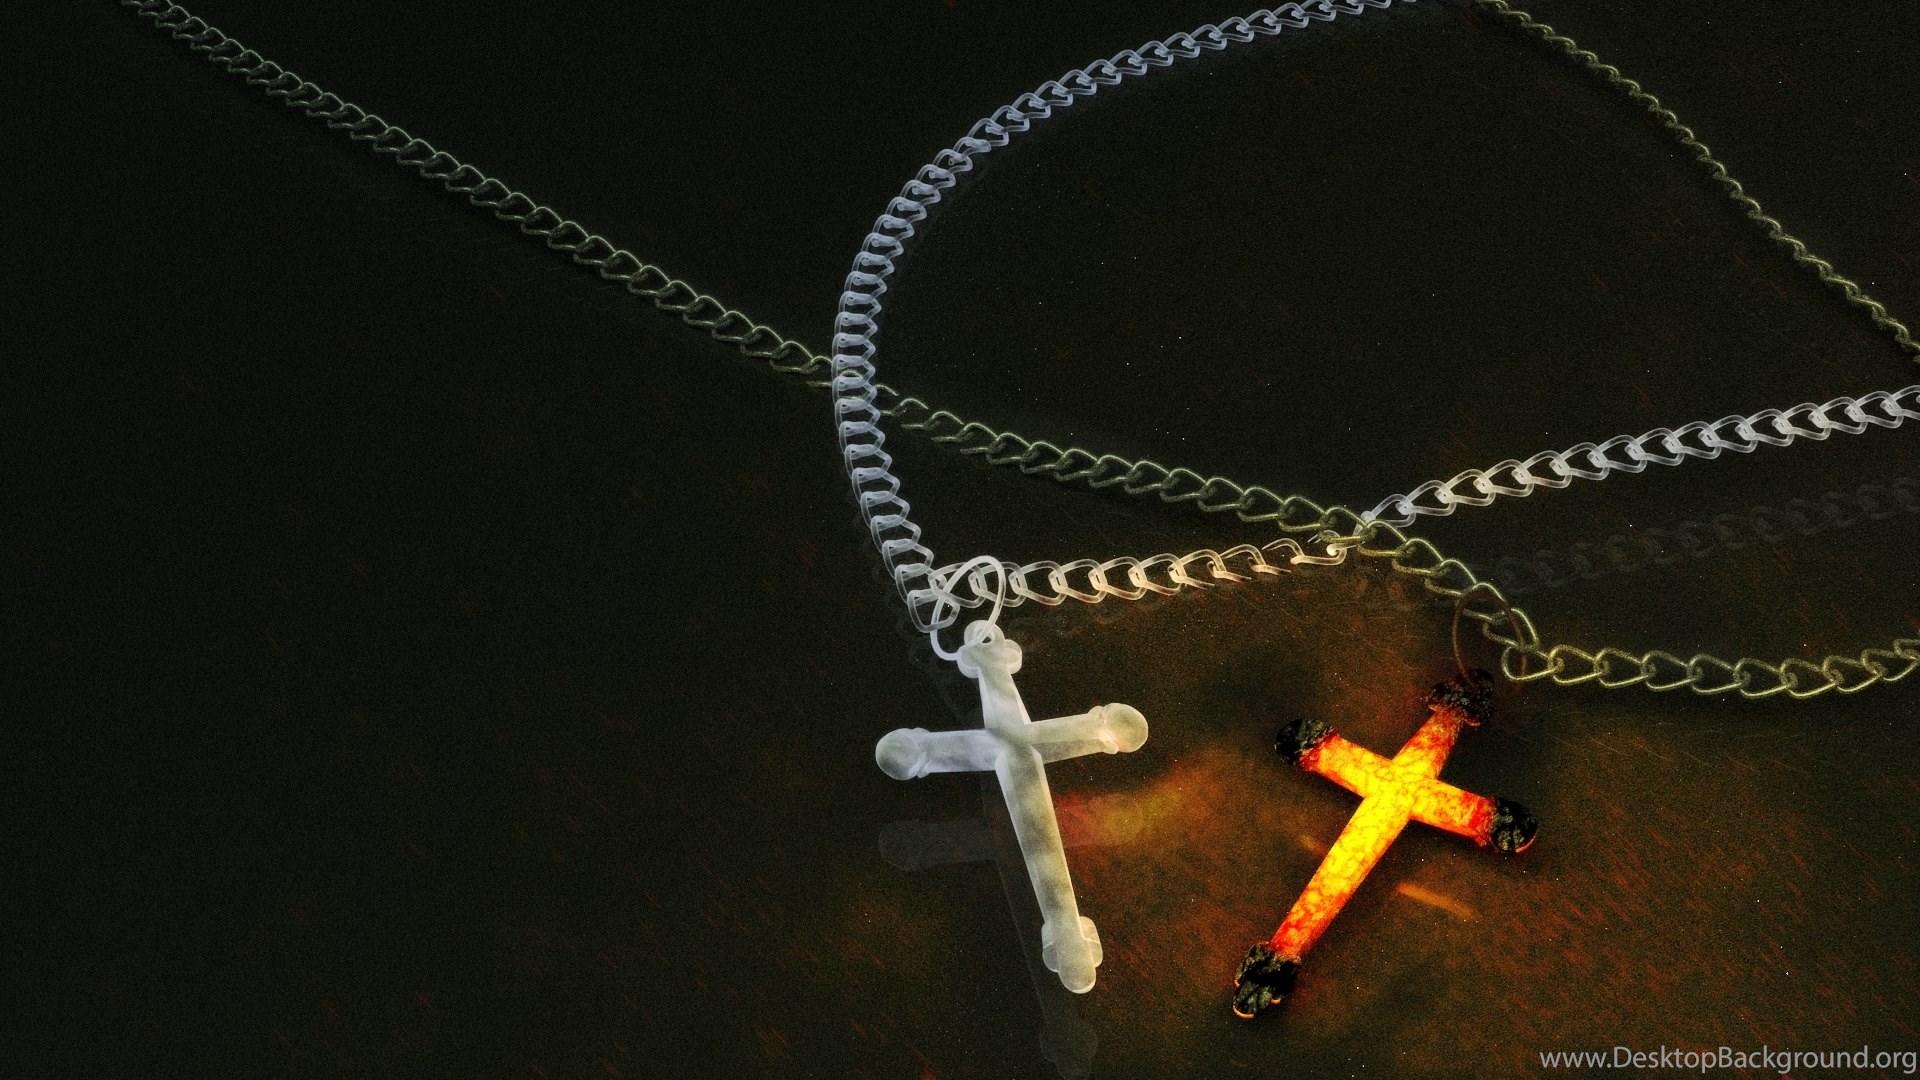 Jesus Christ On The Cross Wallpapers Picture Download Desktop